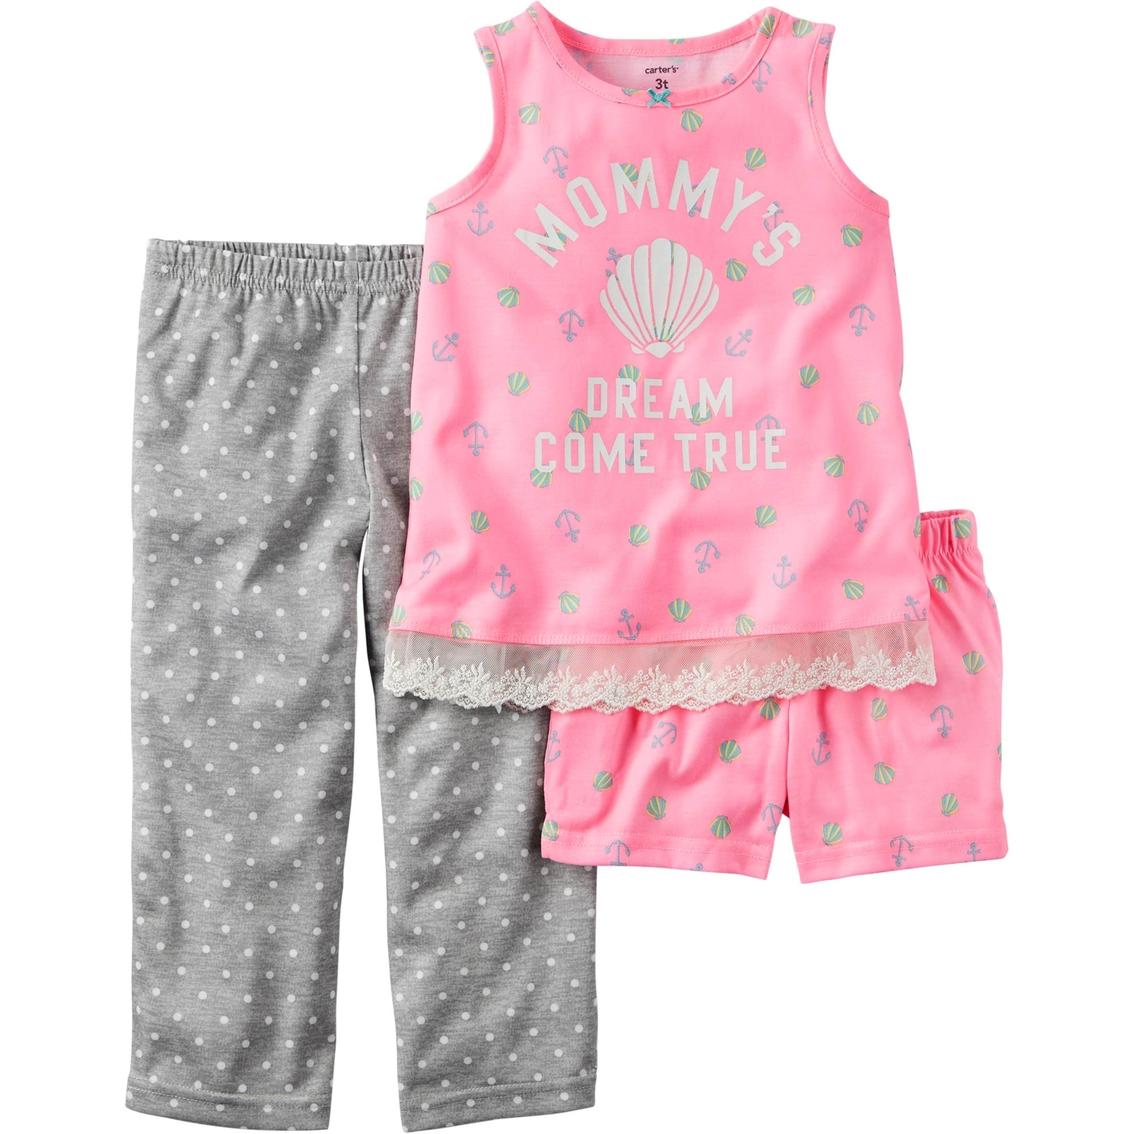 c44f90eb5 Carter s Toddler Girls 3 Pc. Mermaid Cove Pajama Set